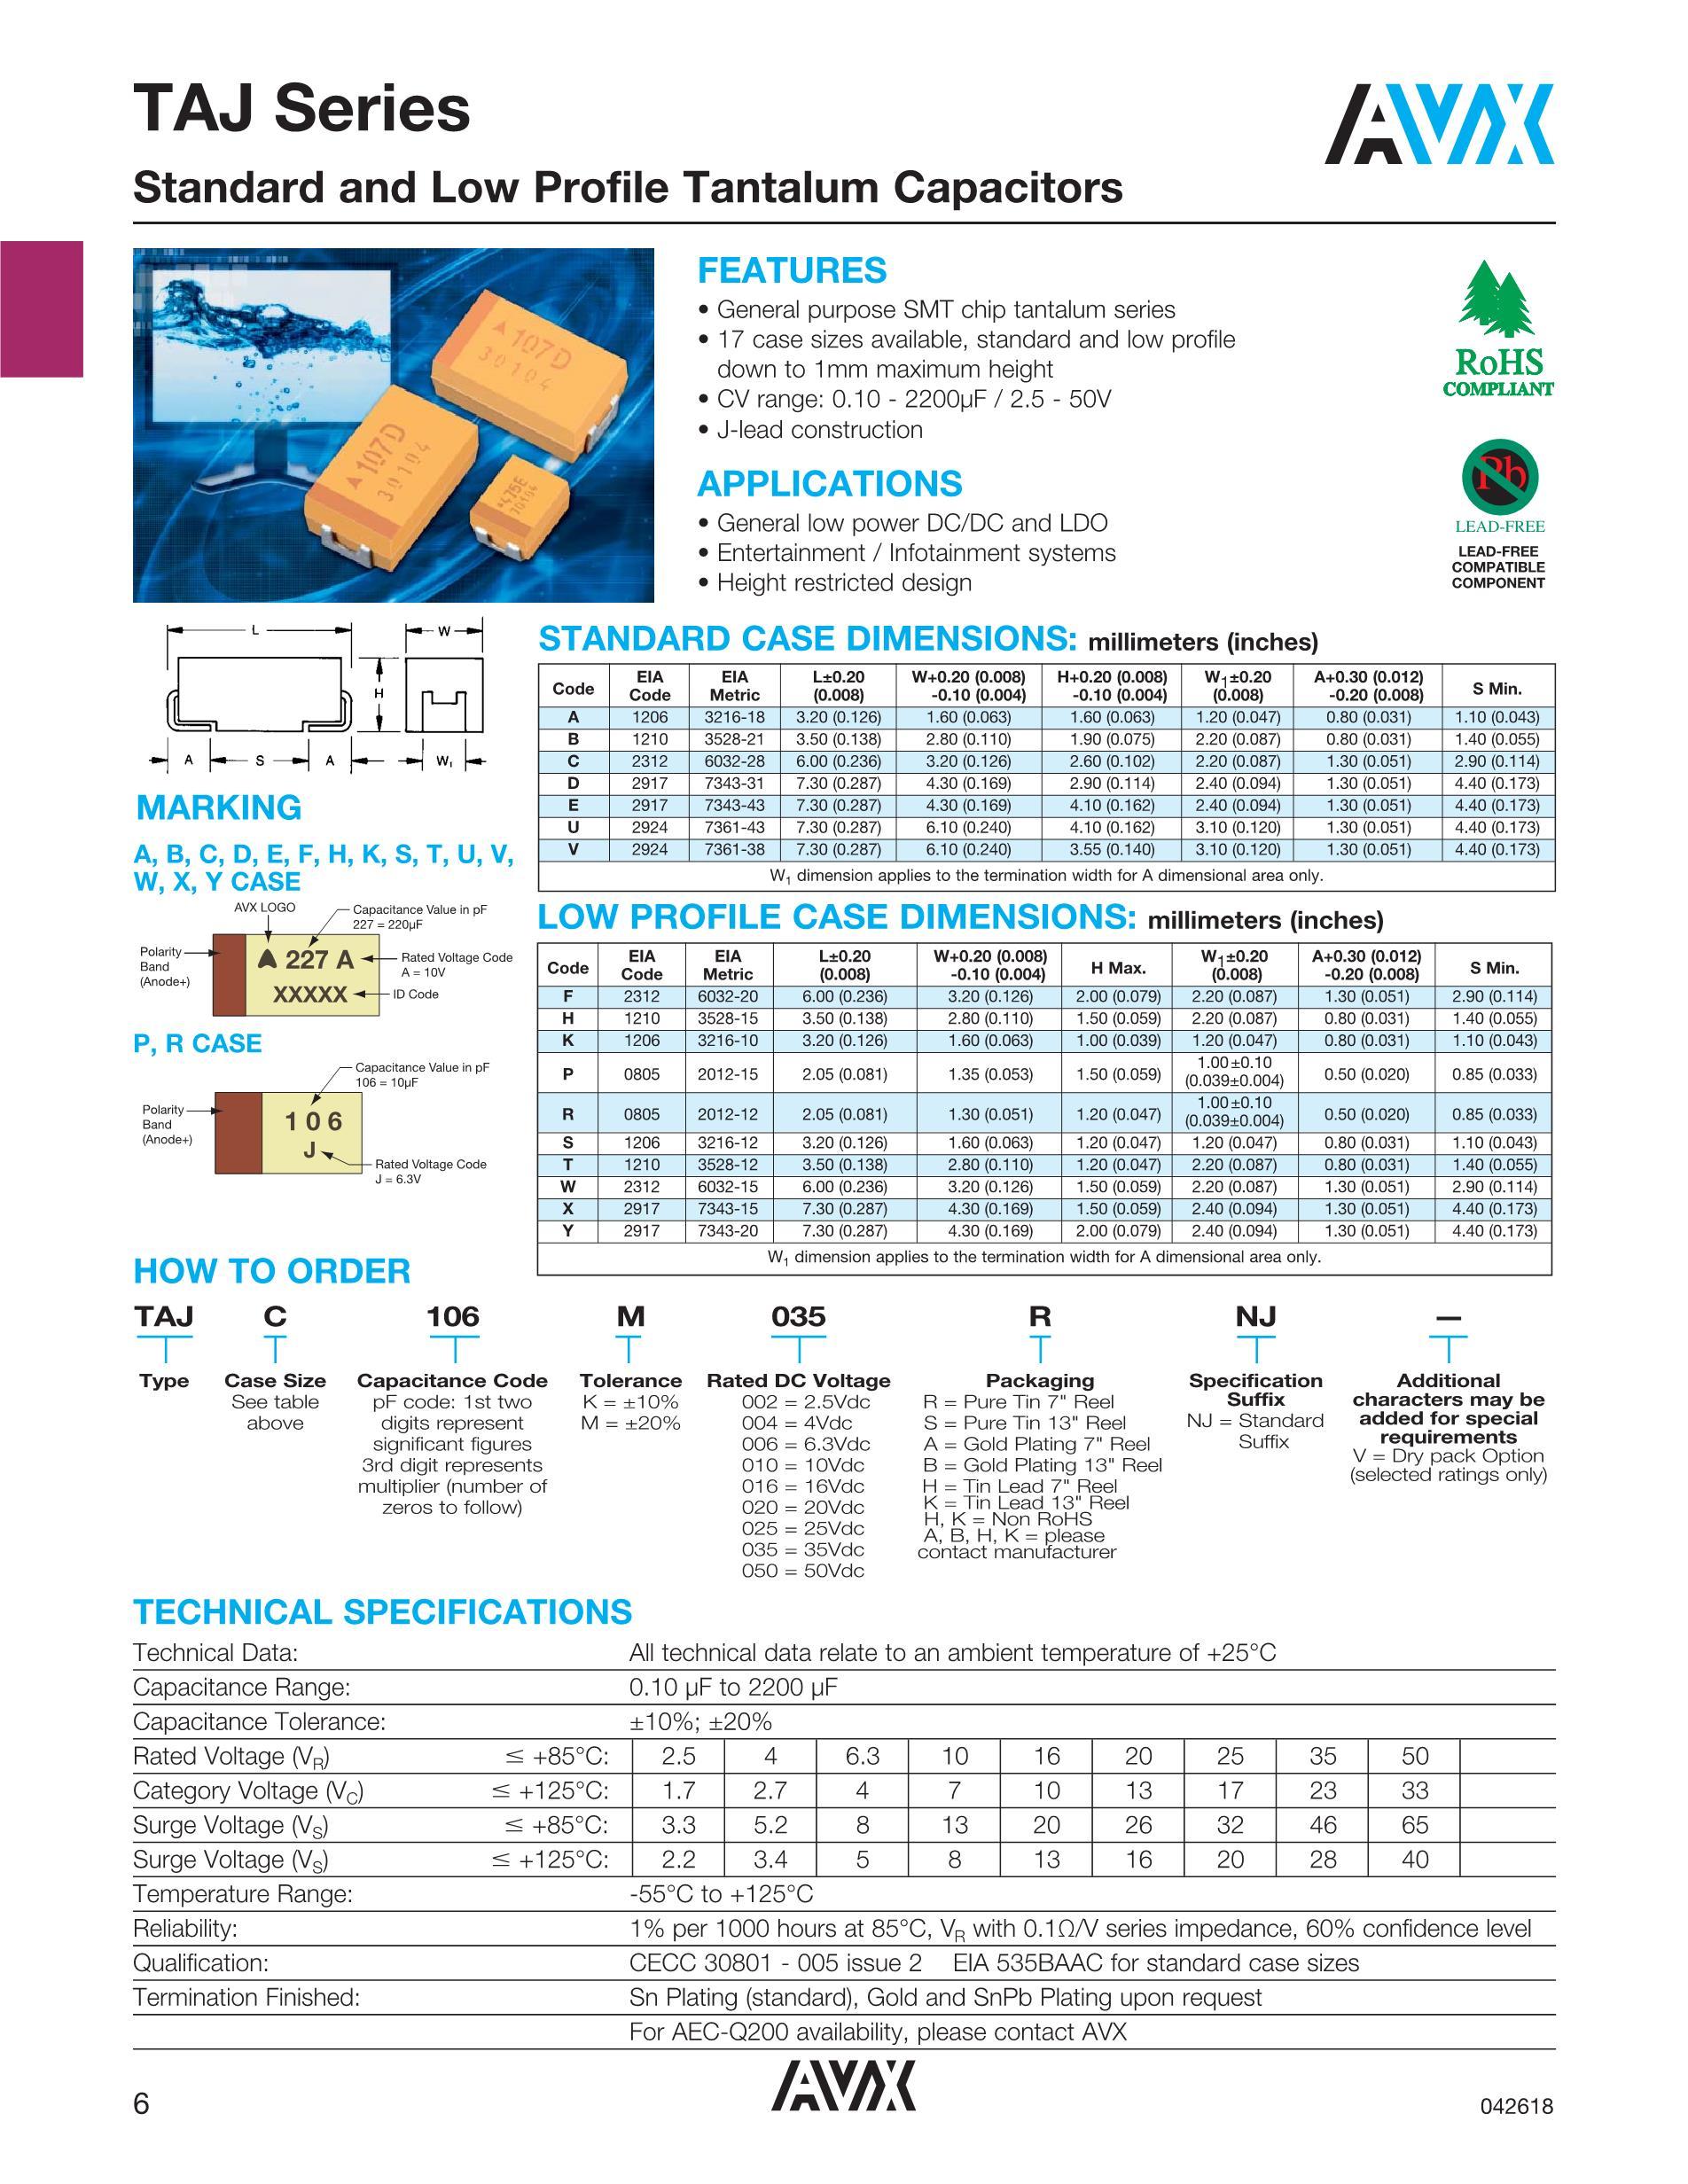 TAJC106M016RNJ(16V10's pdf picture 1